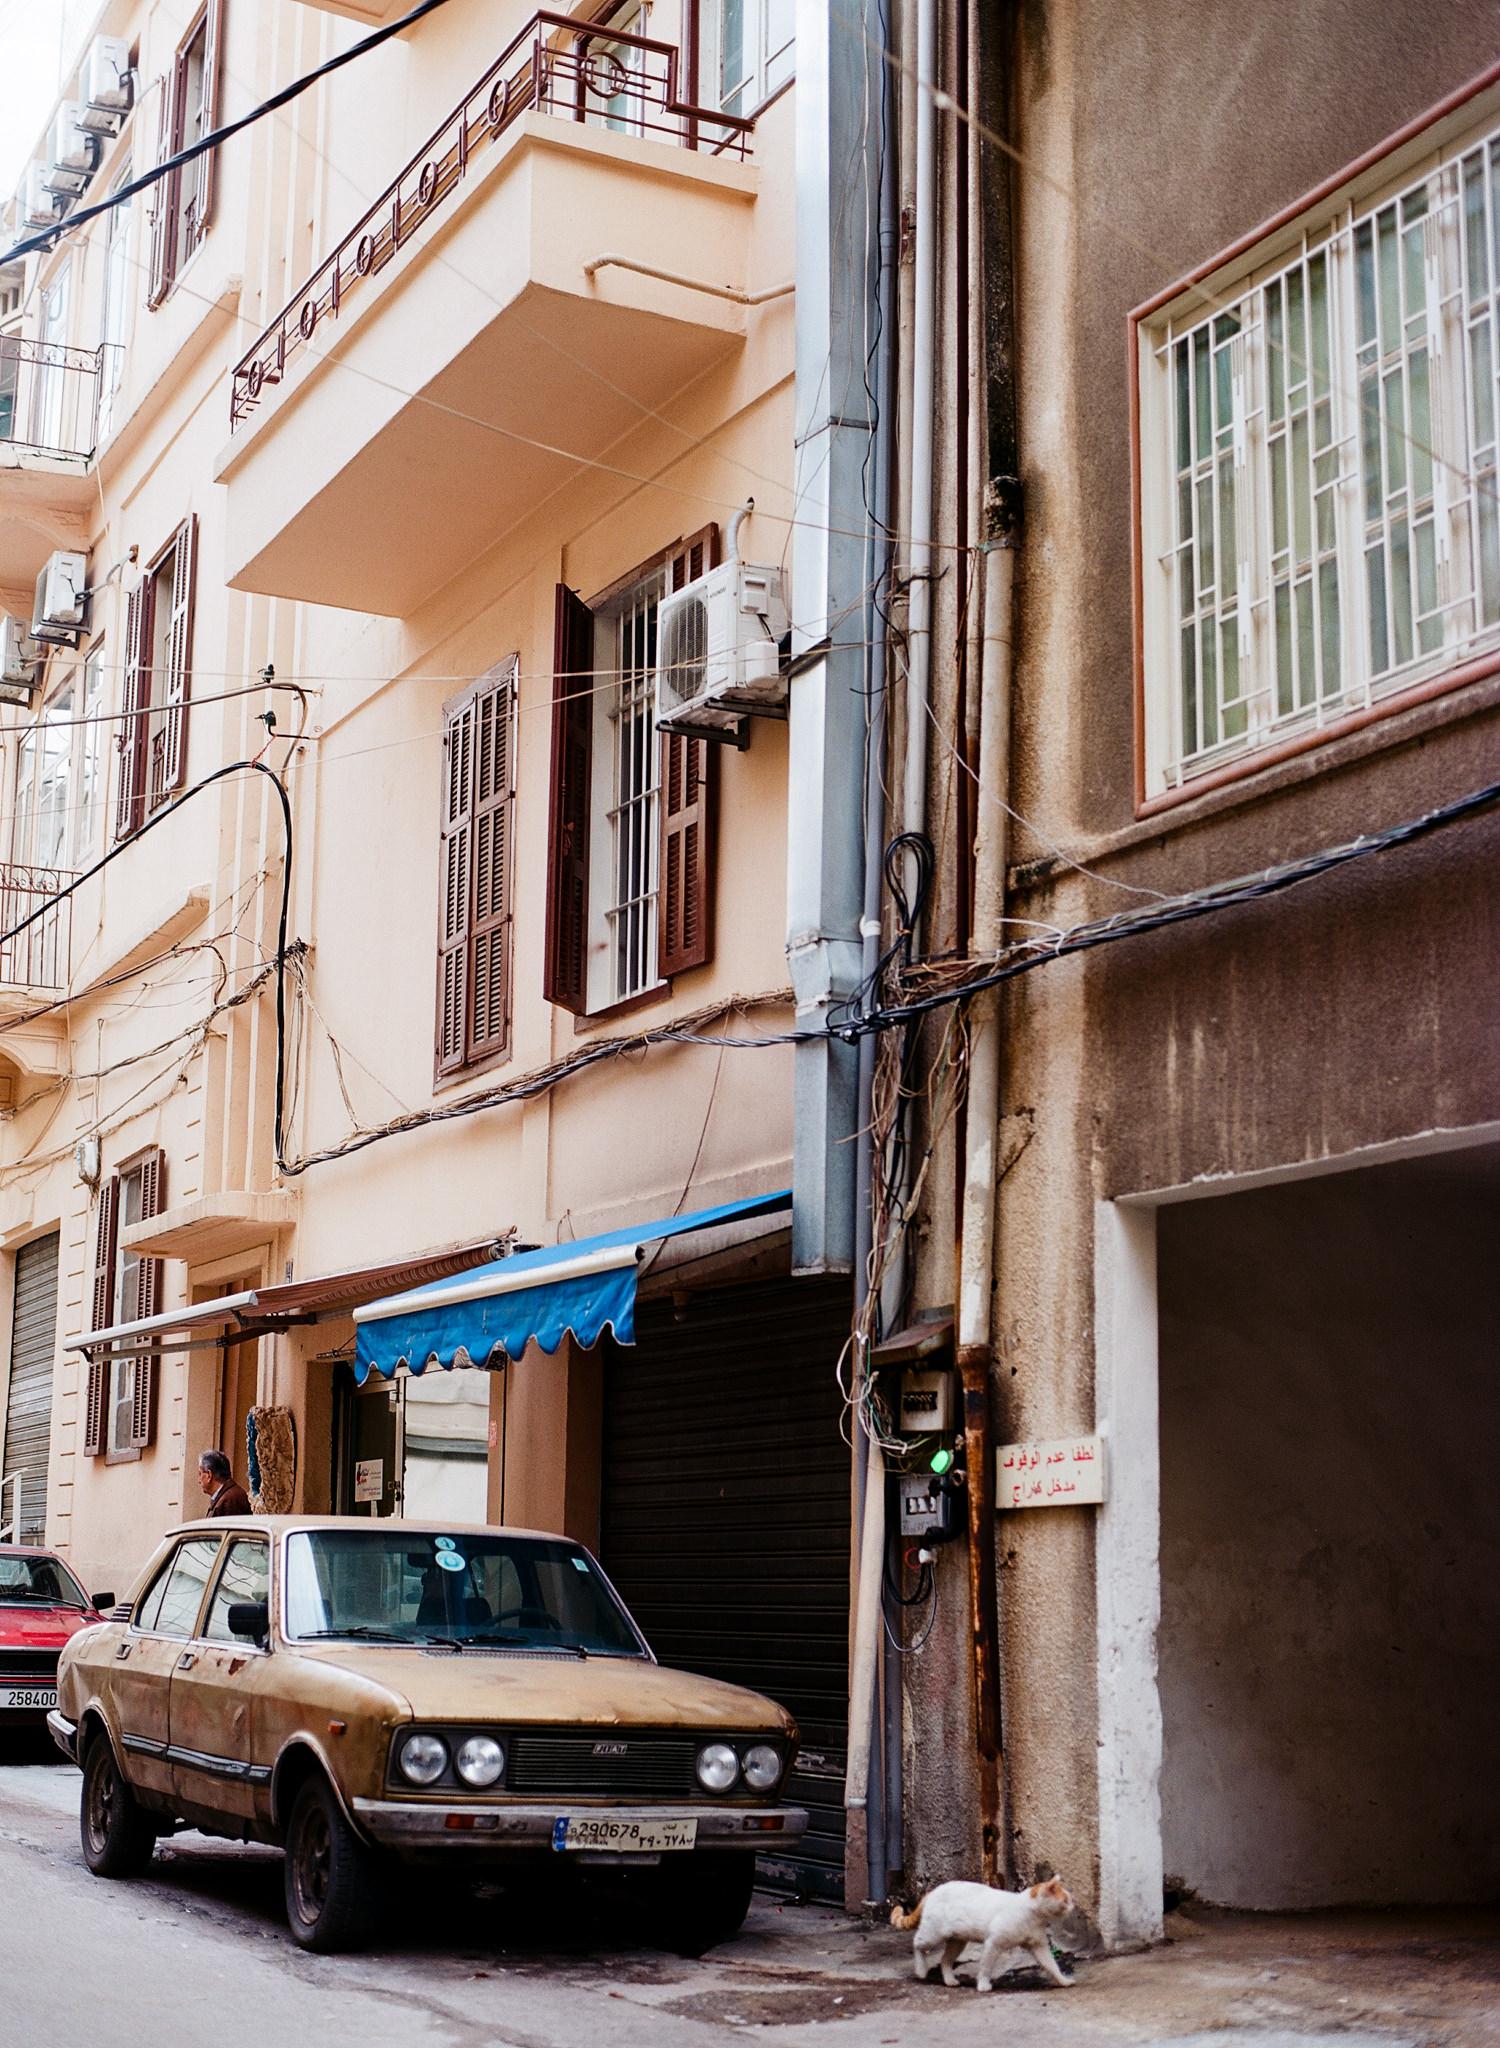 Lebanon-40.jpg